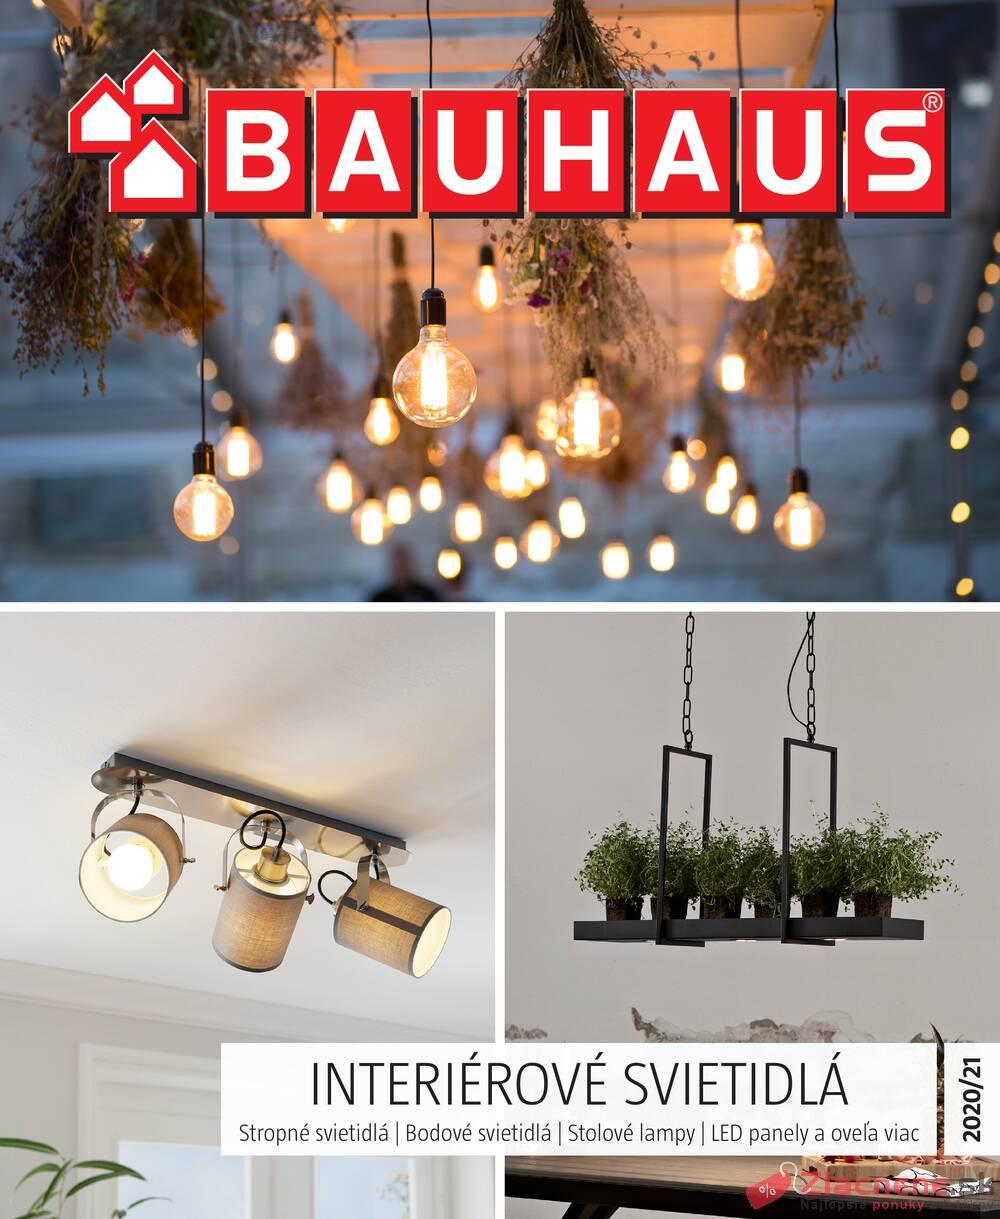 Leták Bauhaus - Bauhaus INTERIÉROVÉ SVIETIDLÁ 29.9. - 28.2. - strana 1